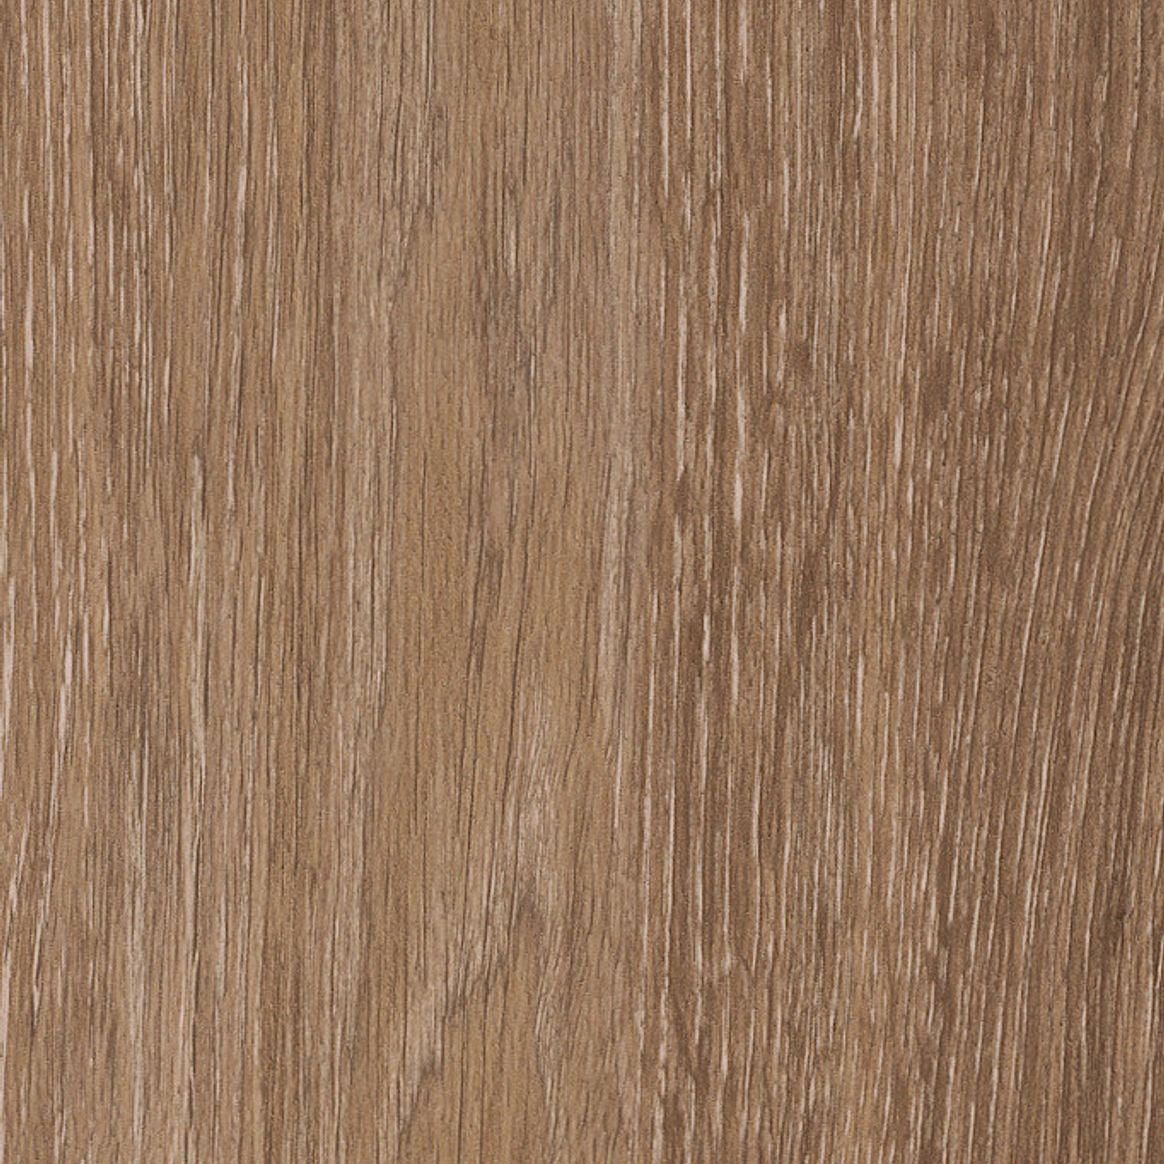 Rustic Limed Wood tile